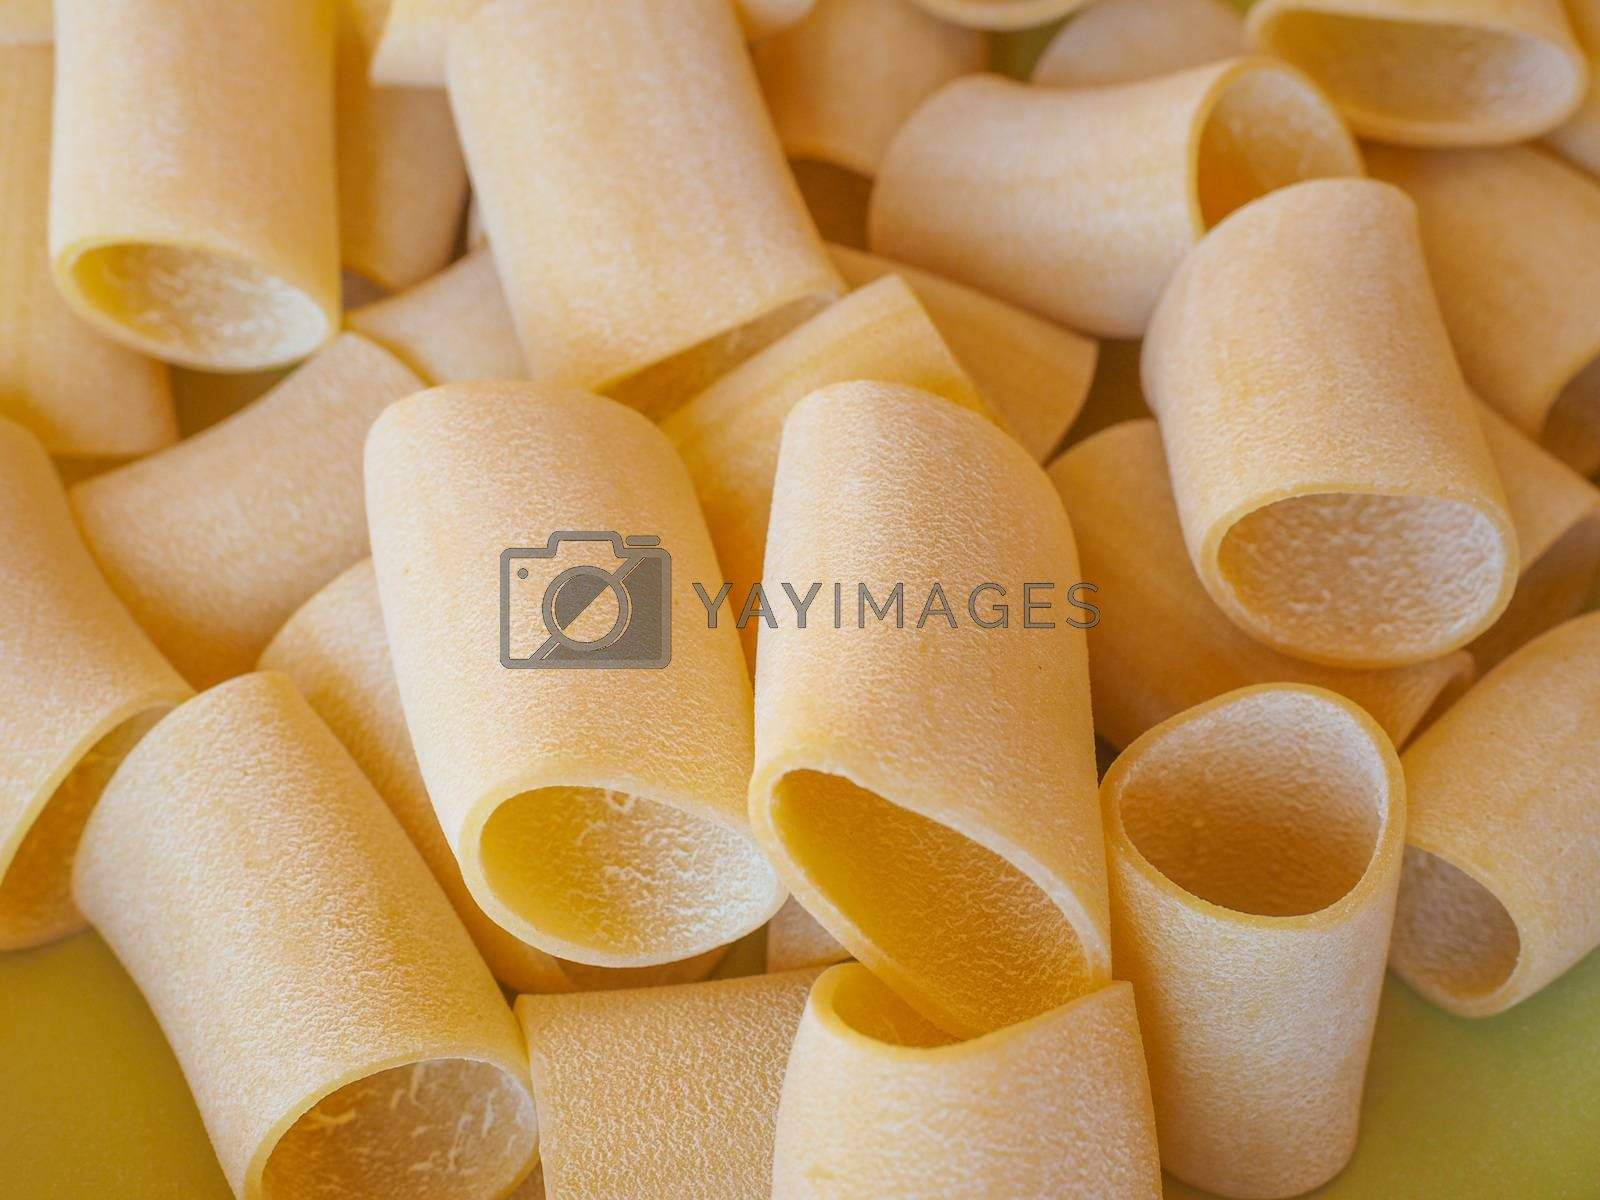 Royalty free image of Paccheri pasta by claudiodivizia